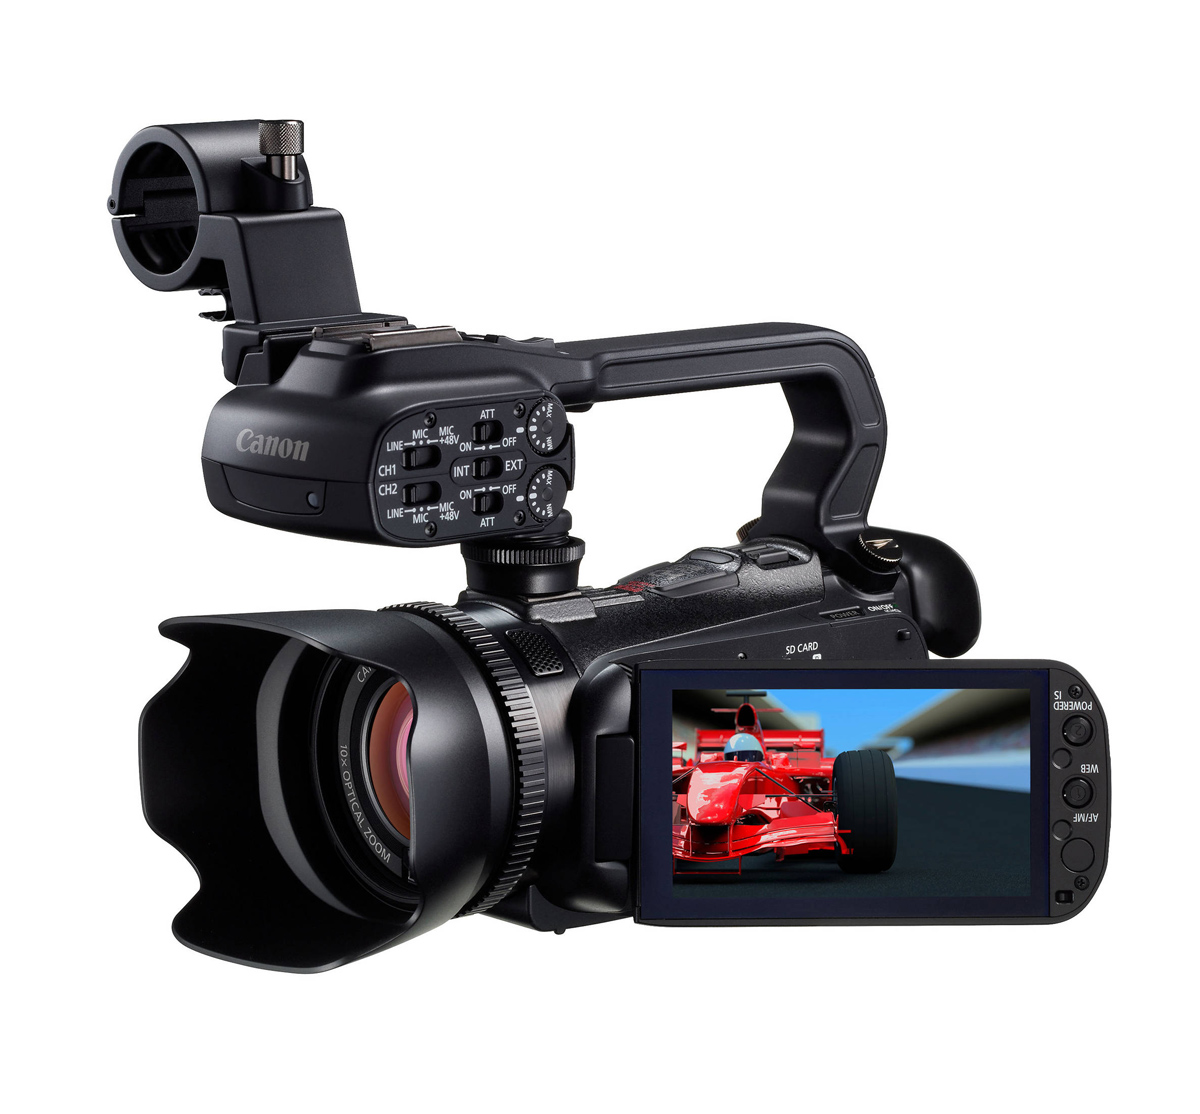 XA10 High Definition Professional Camcorder